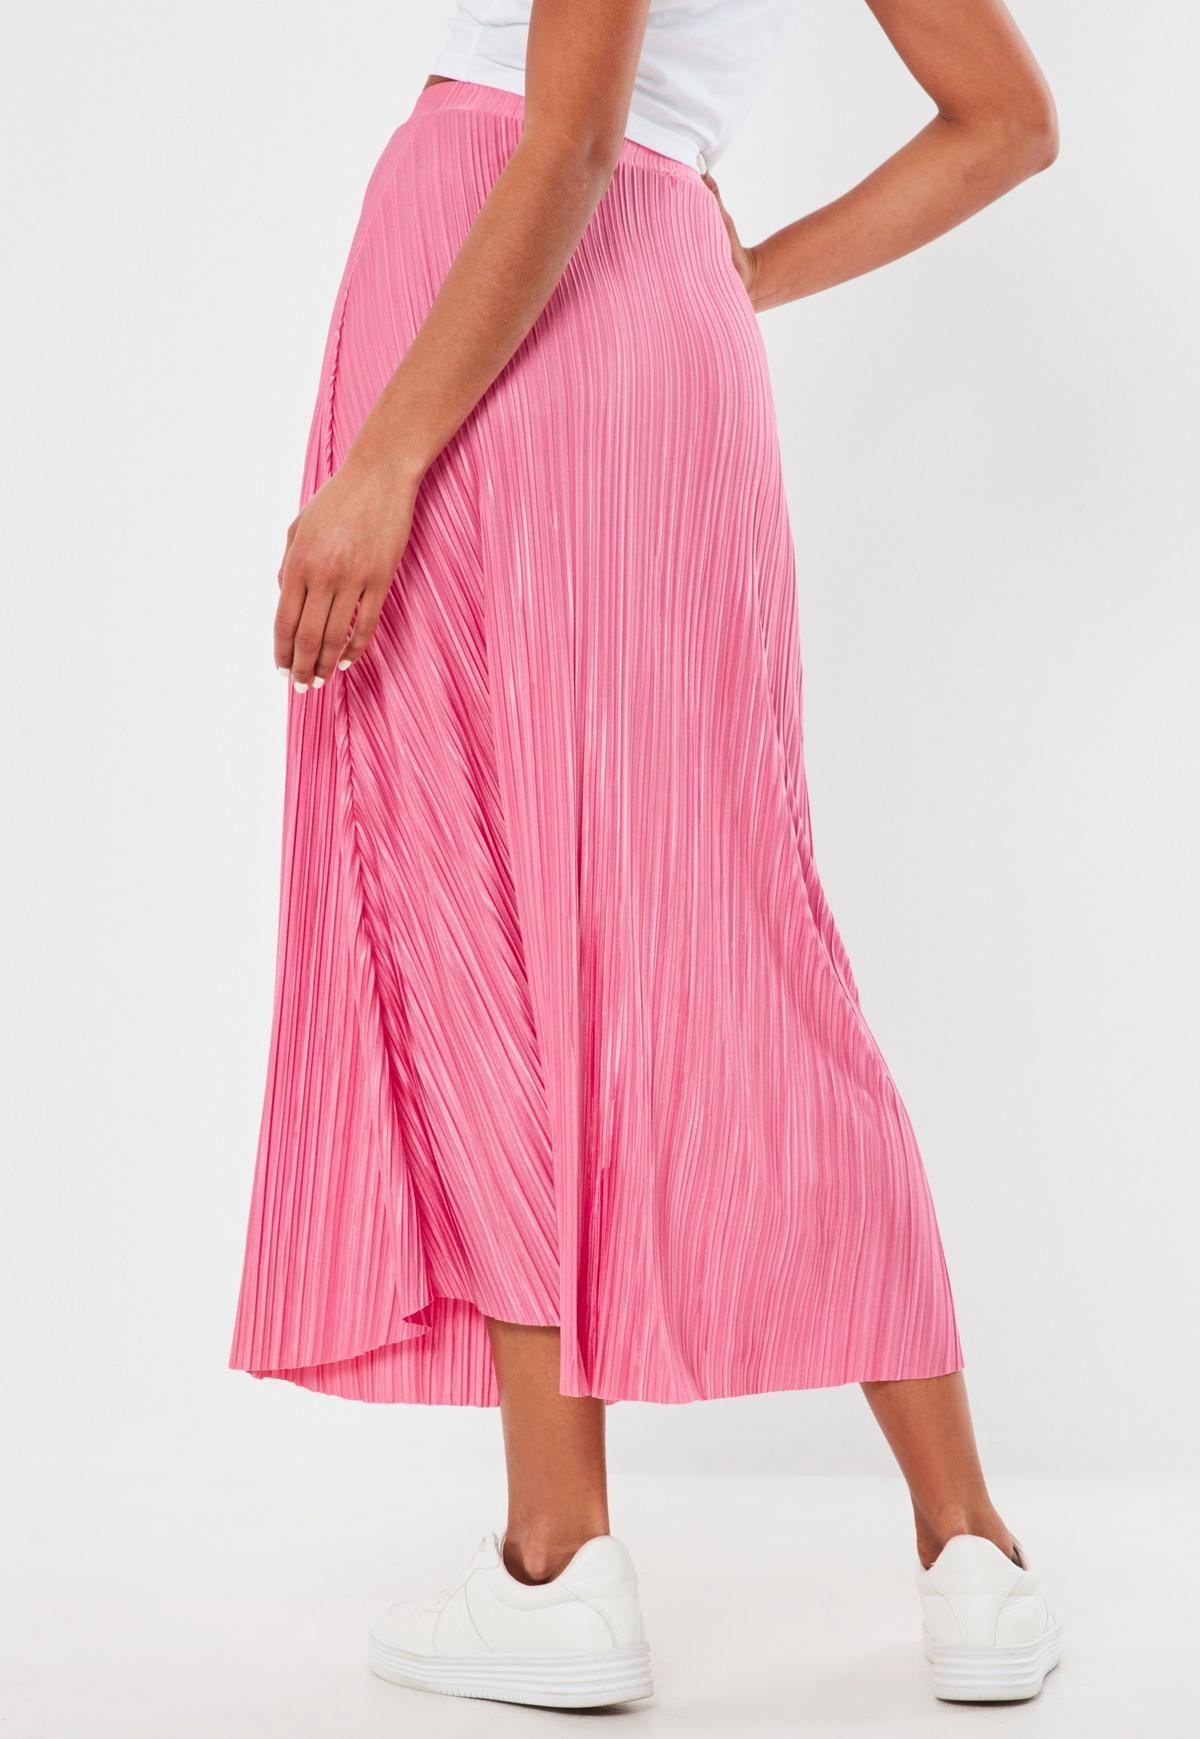 Długa różowa spódnica plisowana Bakko Vox Róż | Modema.pl